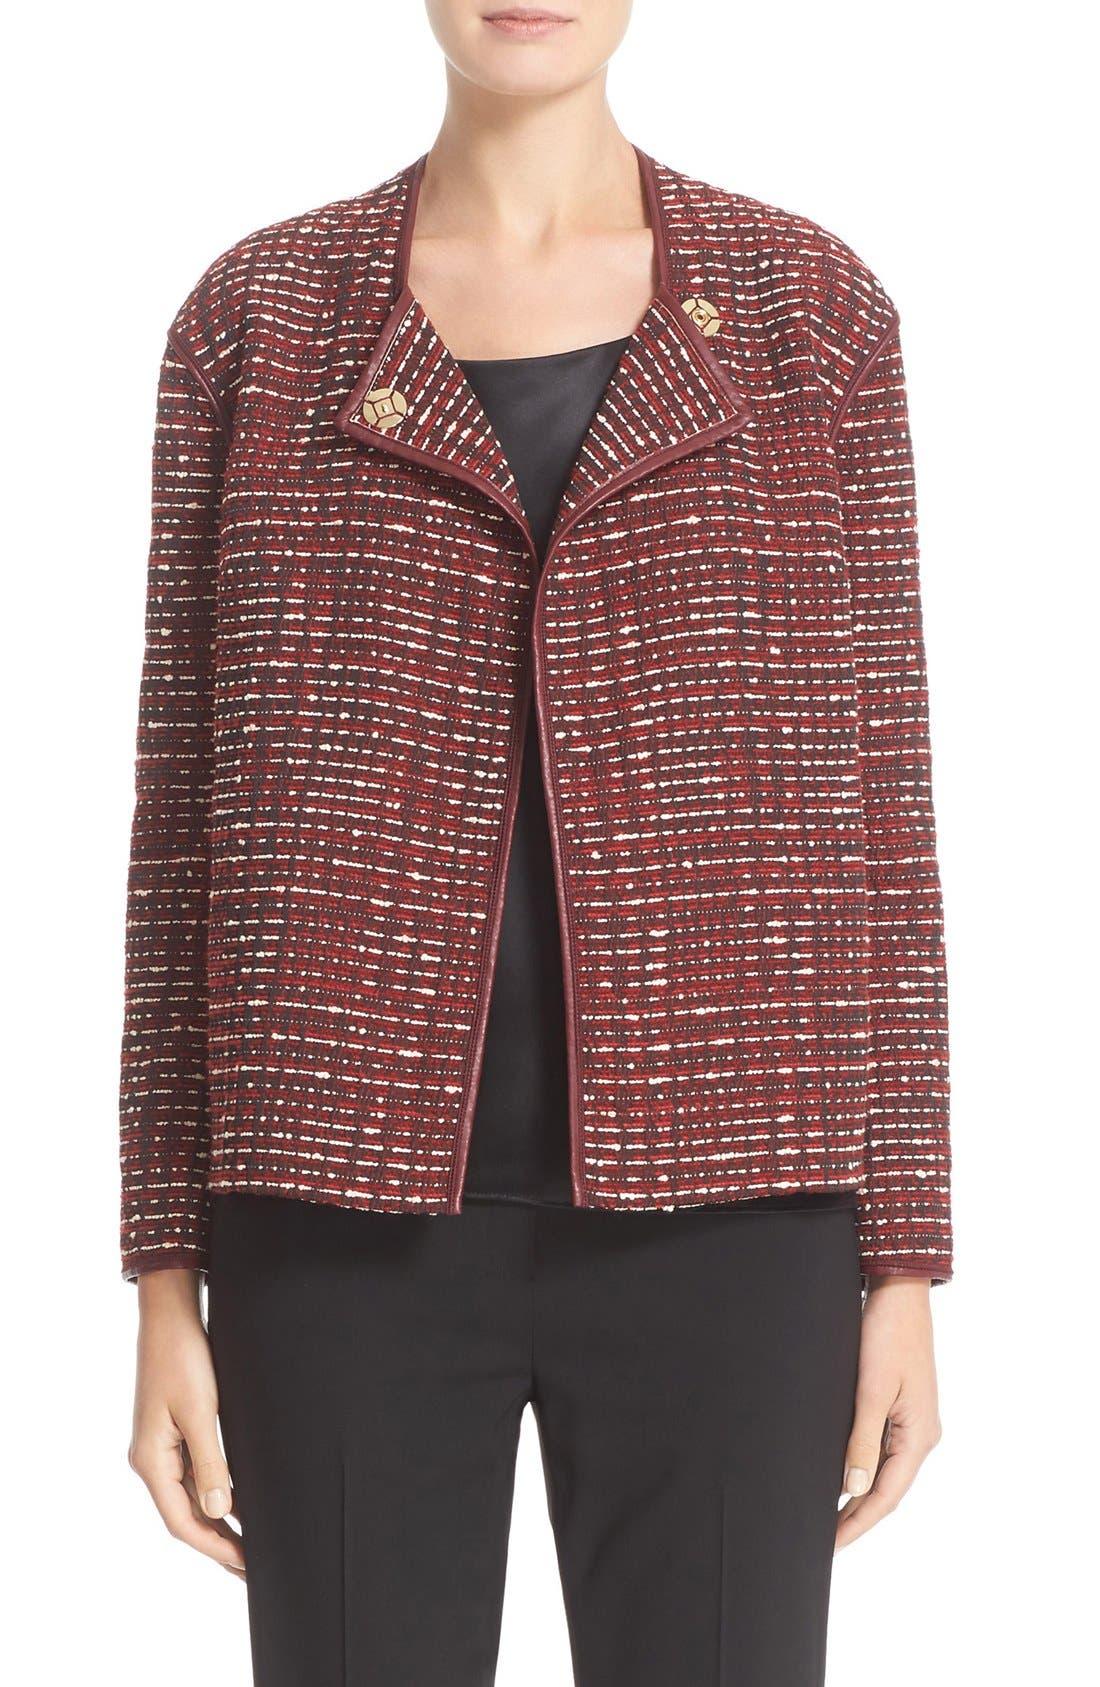 Alternate Image 1 Selected - Lafayette 148 New York 'Dane' Tweed Jacket